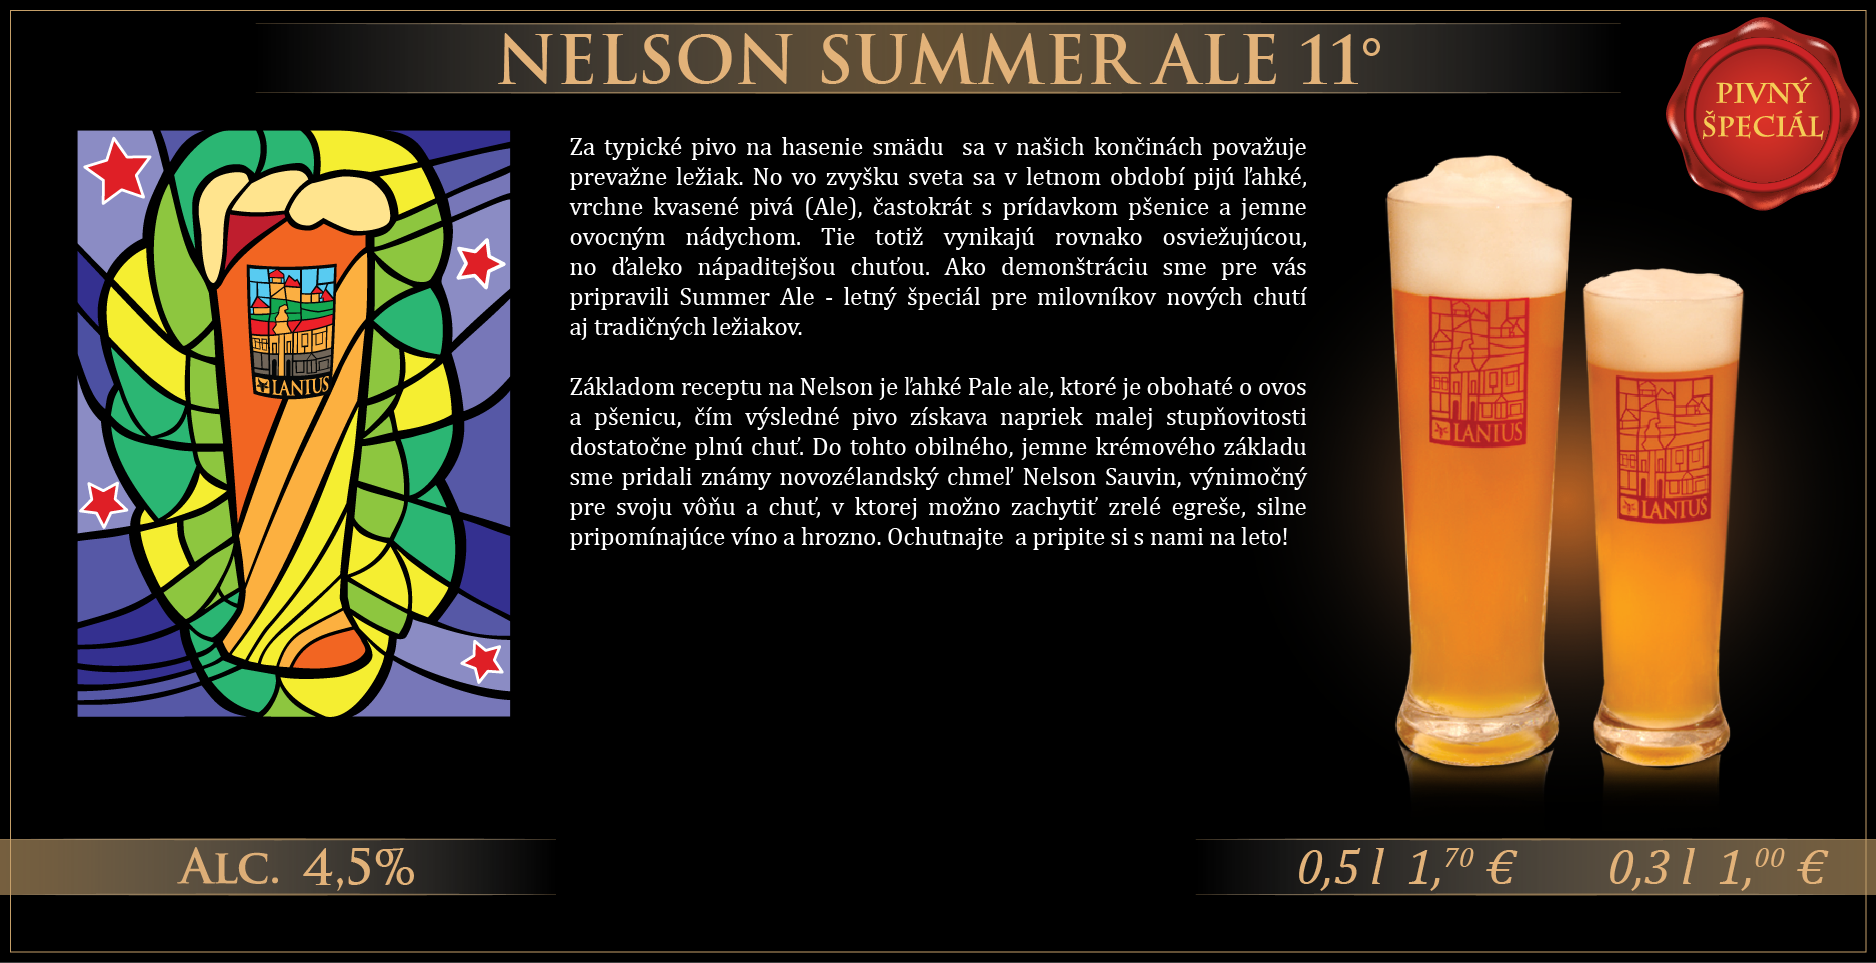 NELSON SUMMER ALE 11 WEB-02